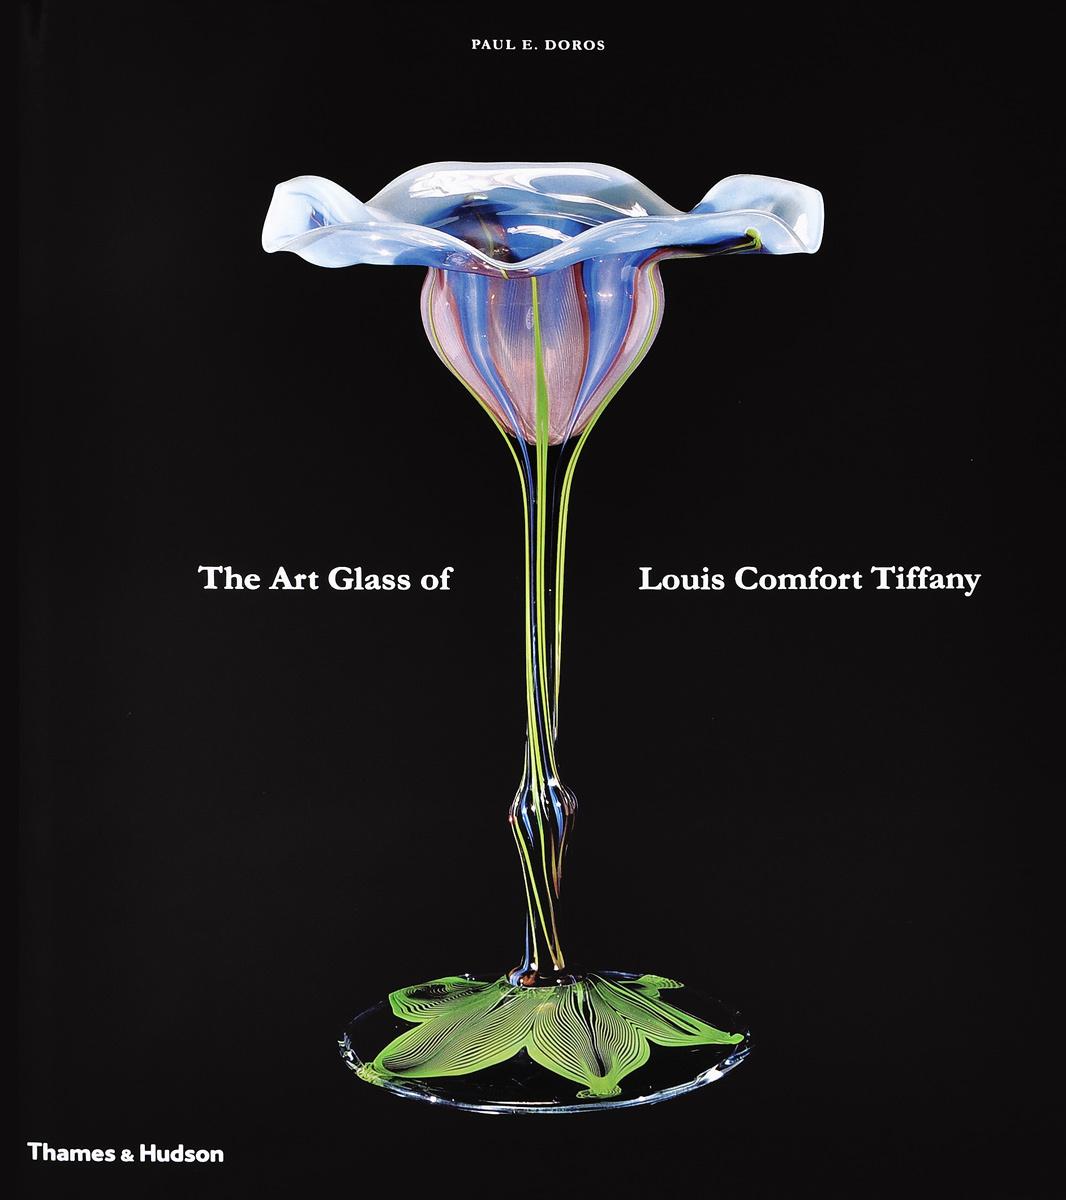 The Art Glass of Louis Comfort Tiffany #1